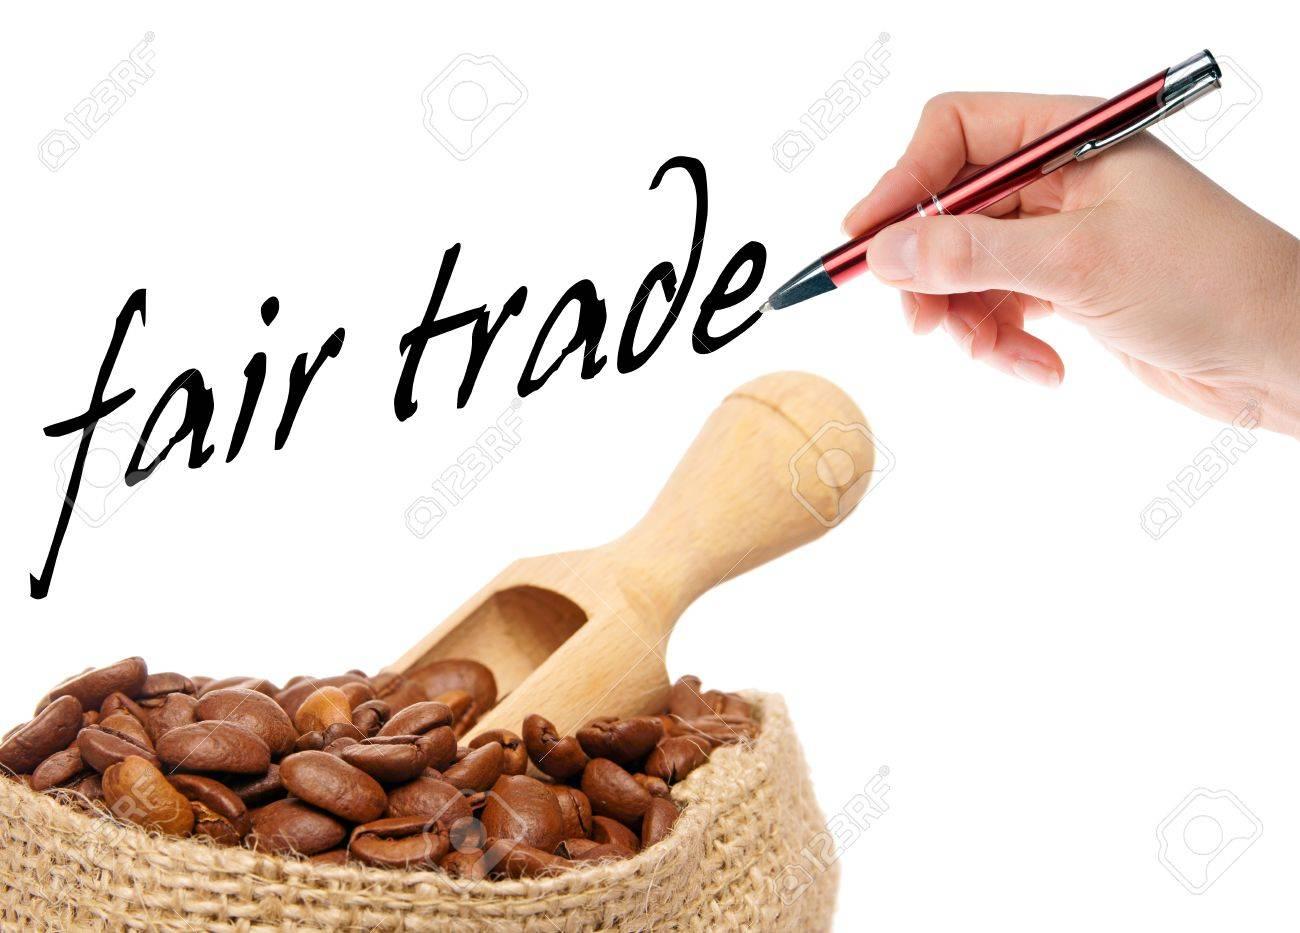 coffee beans with hand writes fair trade - 16695507